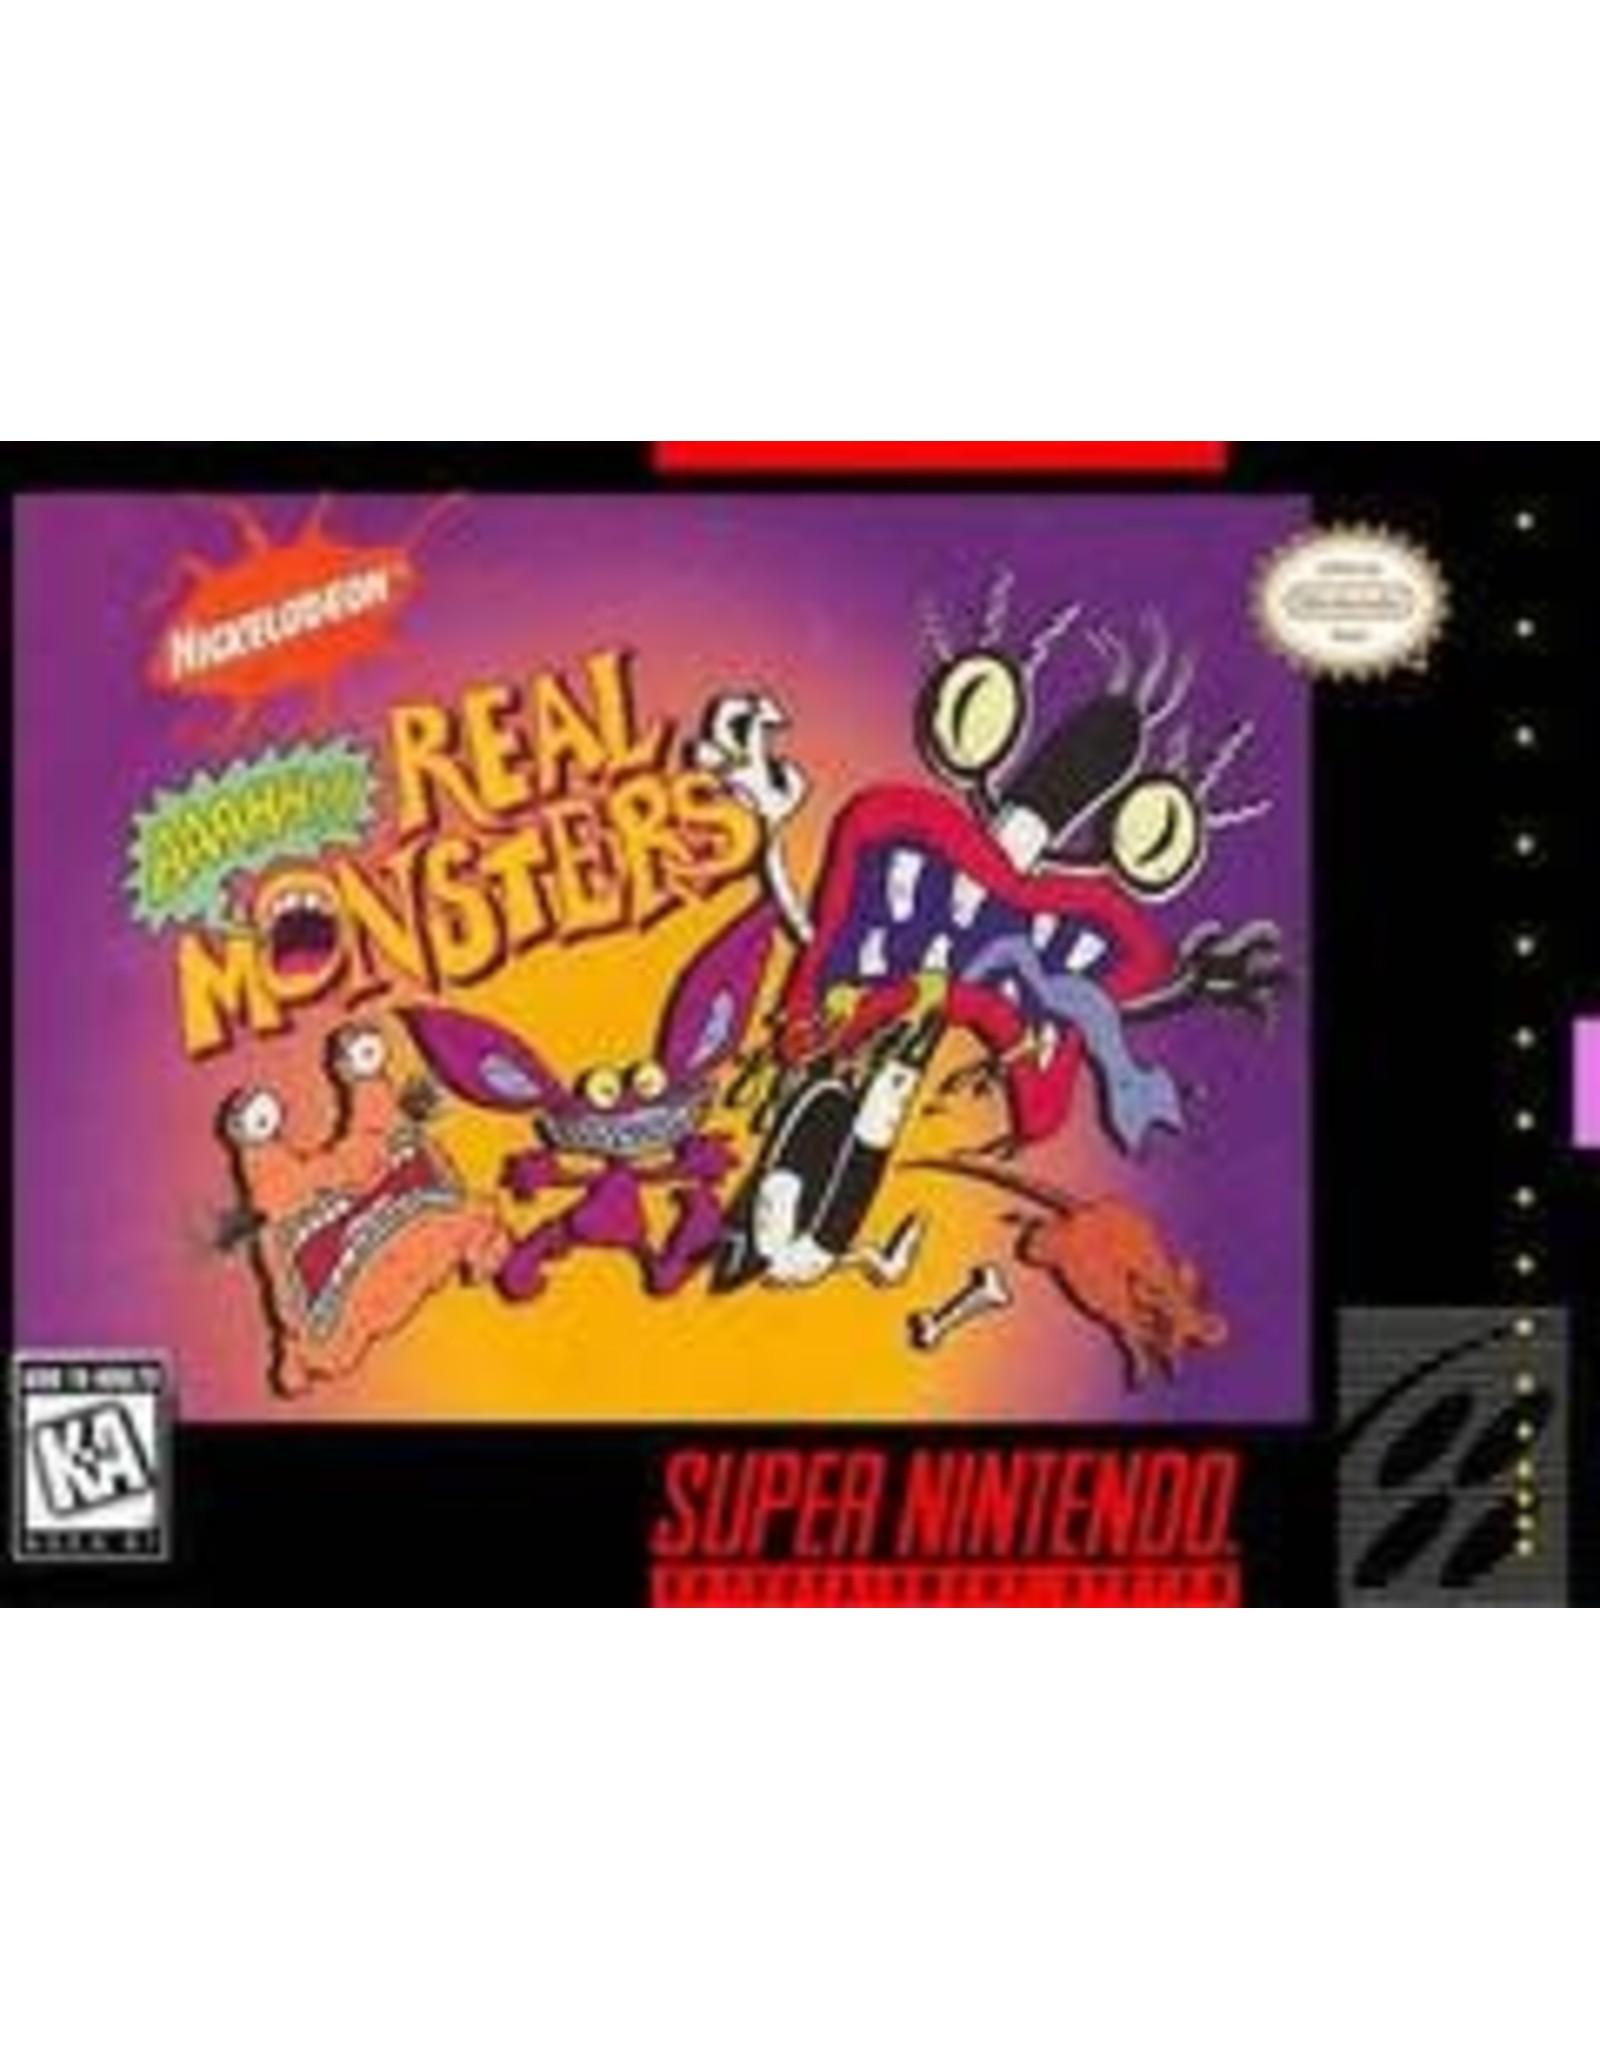 Super Nintendo AAAHH Real Monsters (CiB)